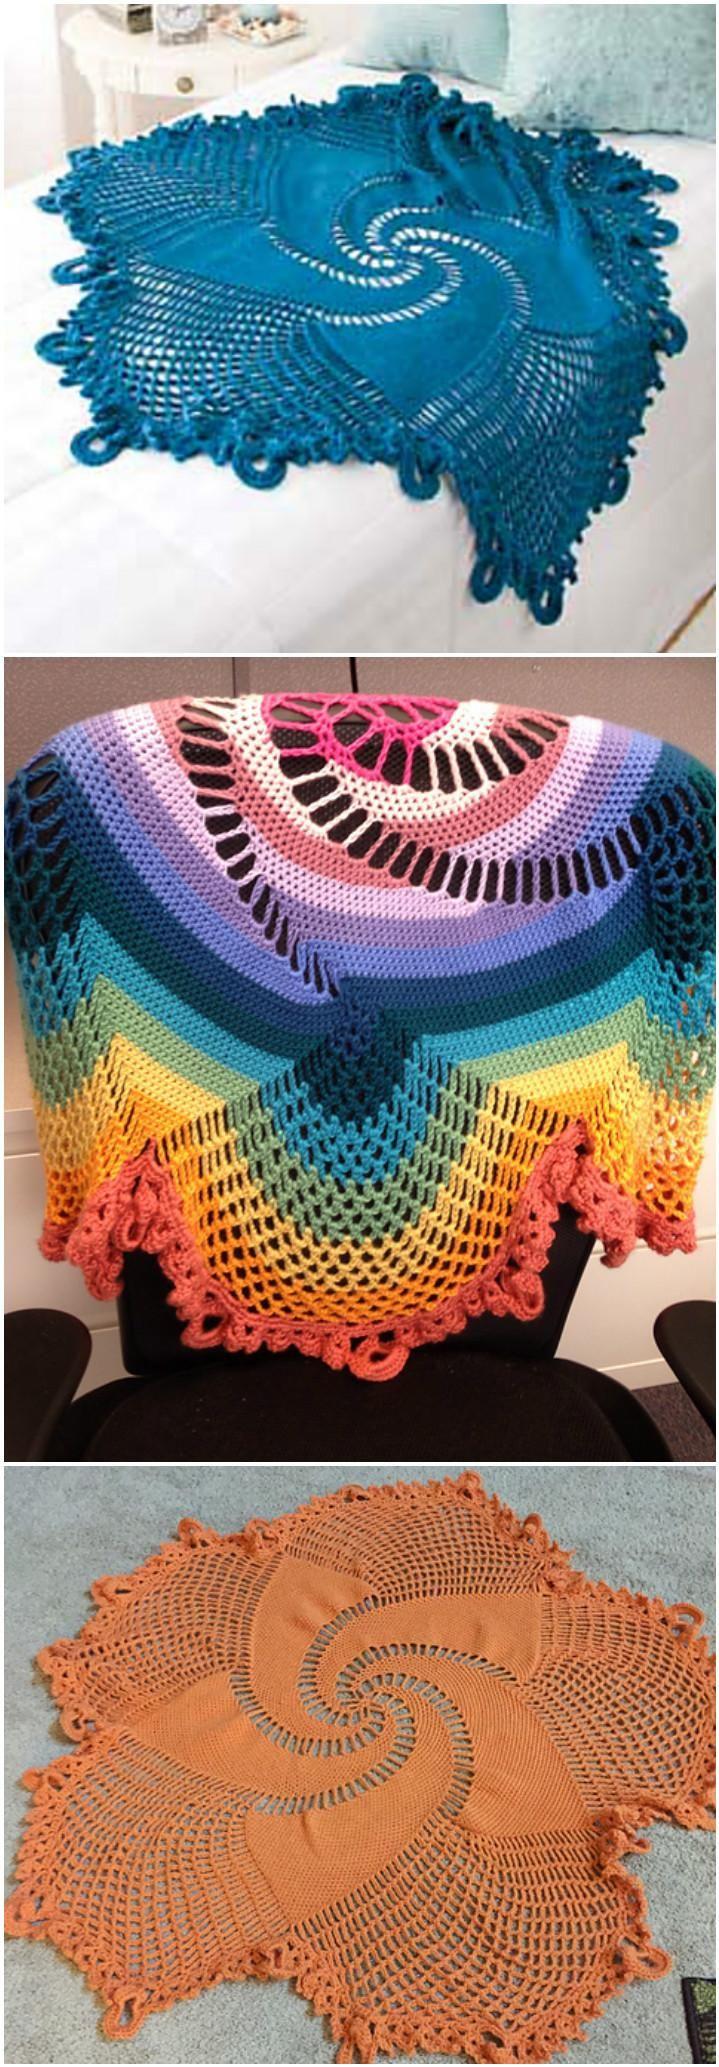 60+ Free Crochet Mandala Patterns | Häkeln ideen, Häkeldecke und ...